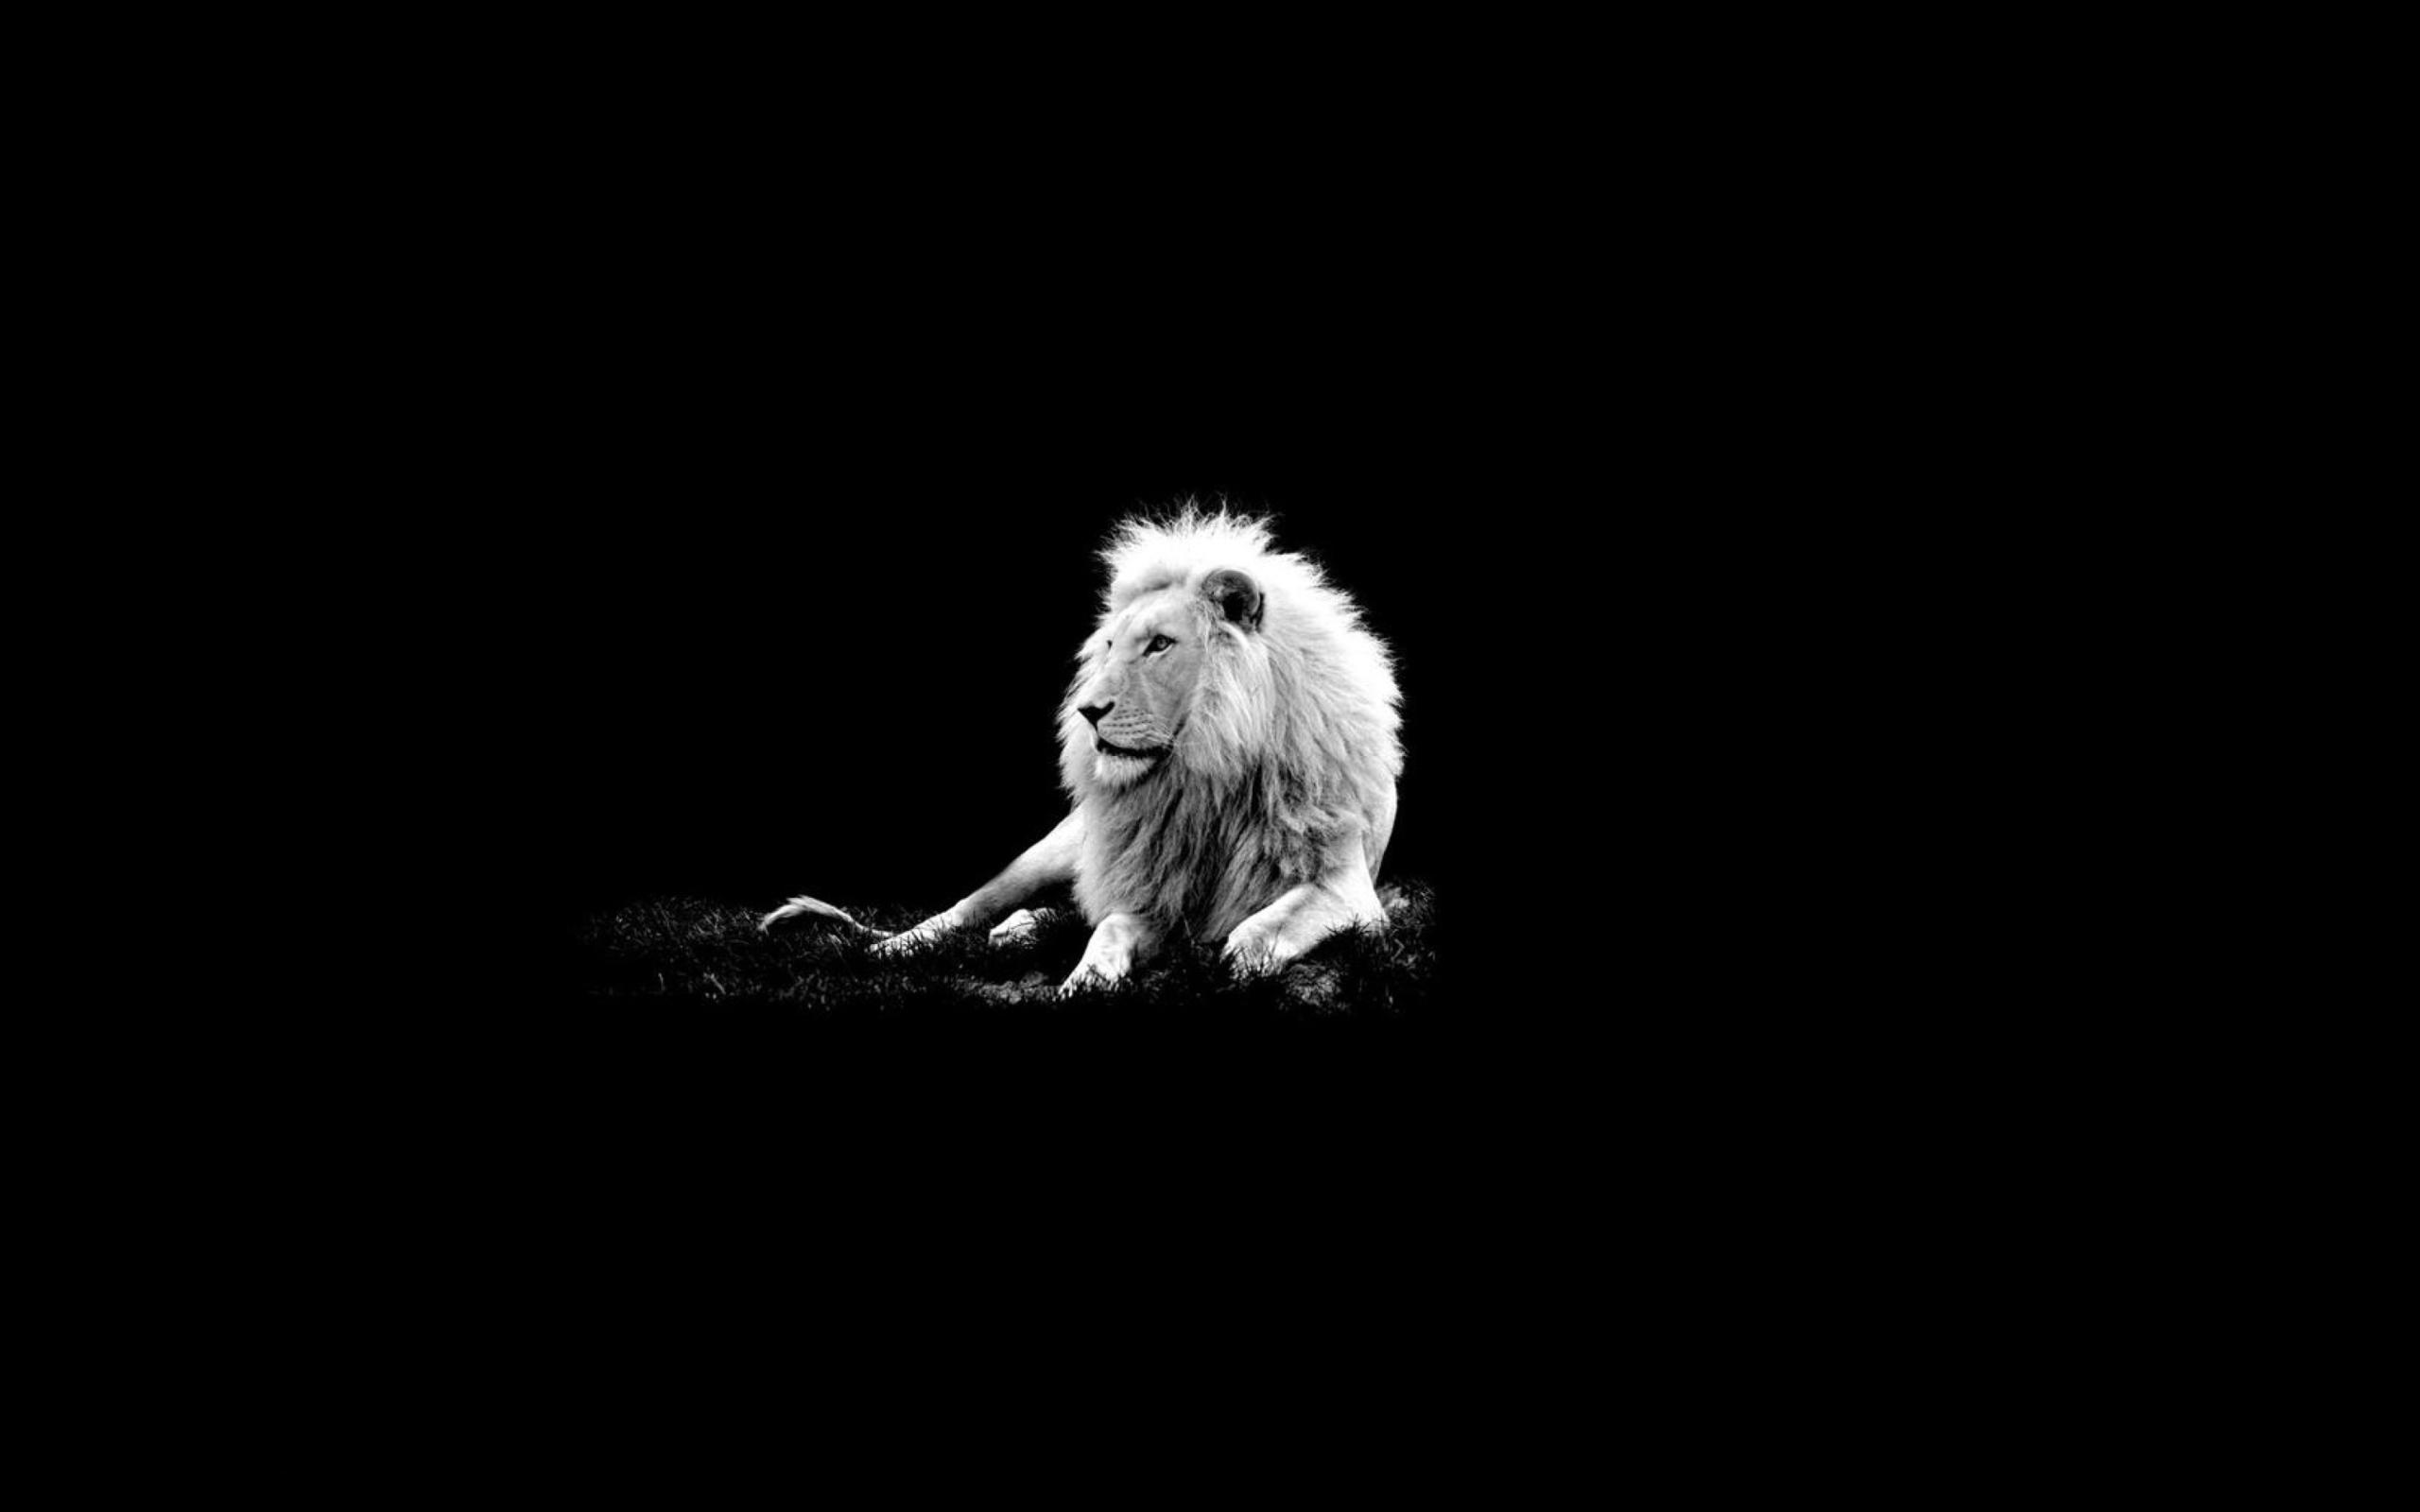 Лев на черном фоне без смс